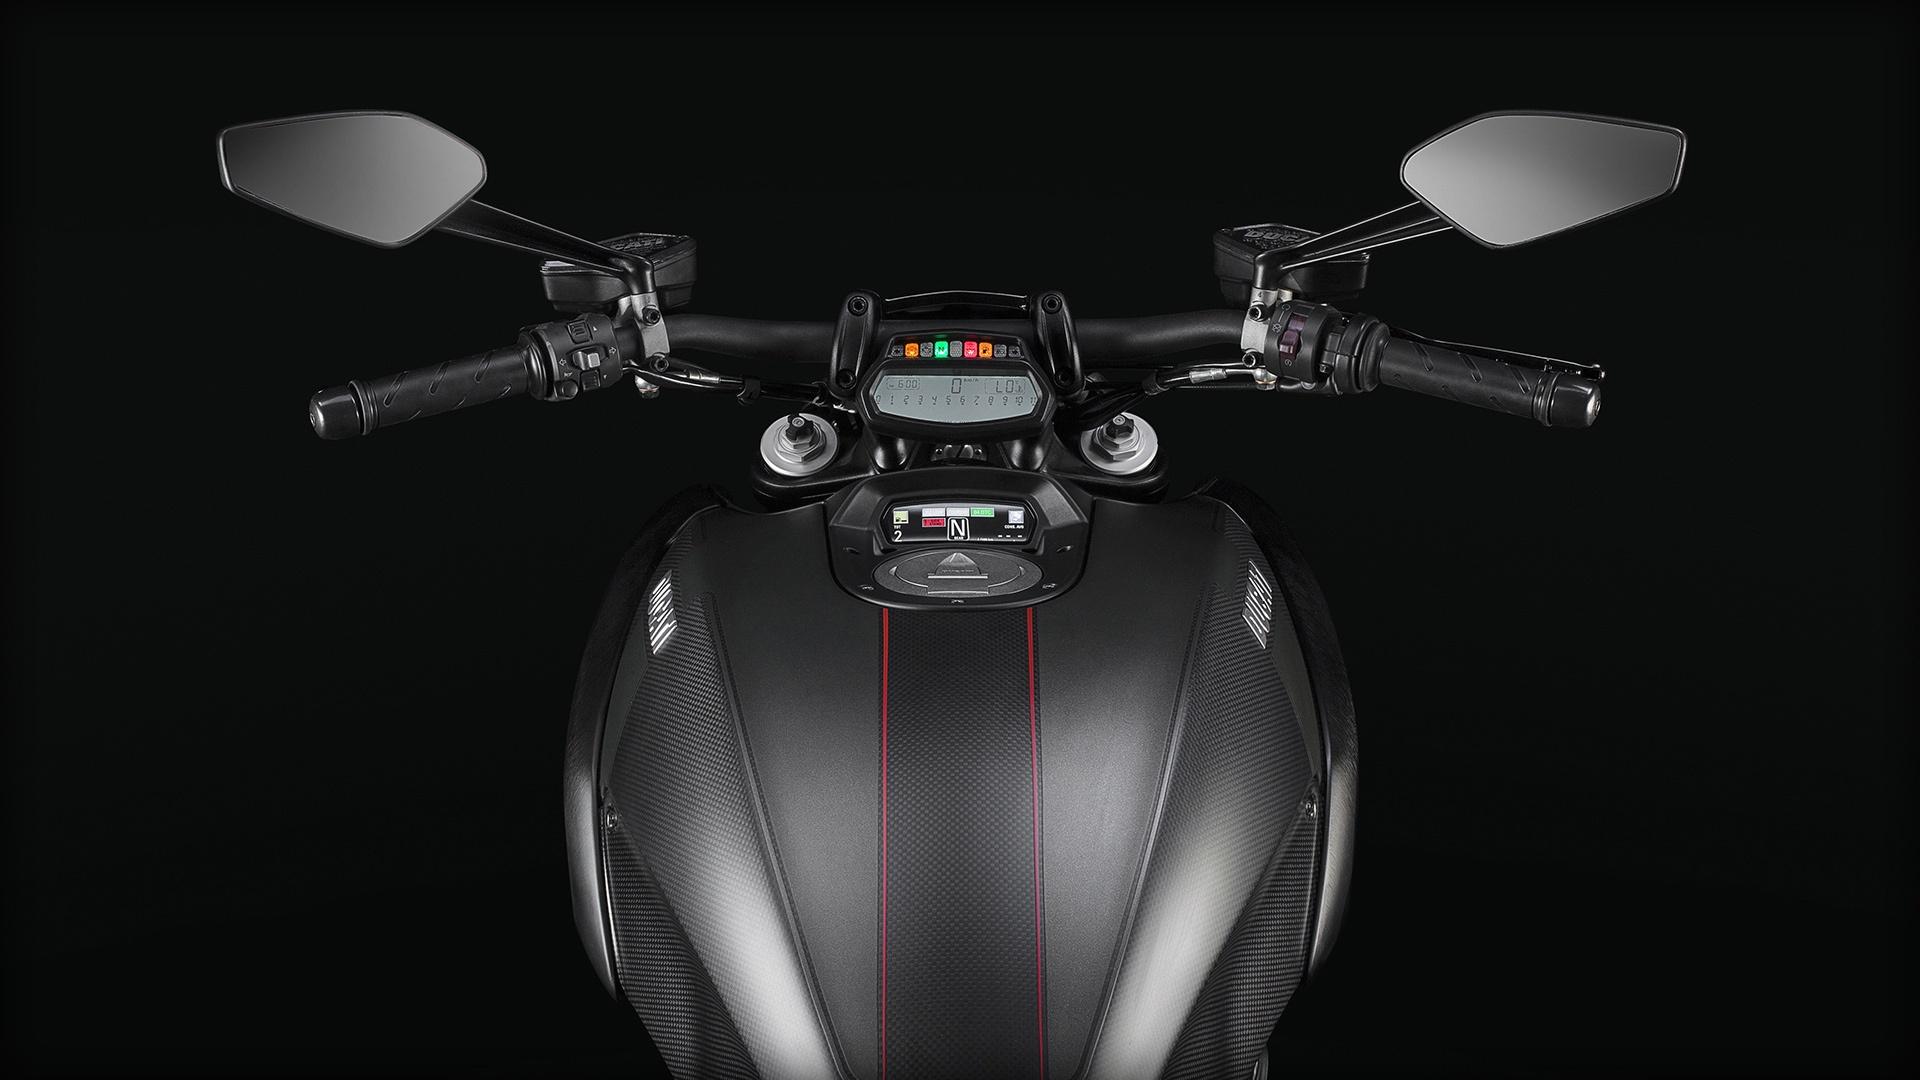 МОТОЦИКЛ DUCATI DIAVEL CARBON  Артмото - купить квадроцикл в украине и харькове, мотоцикл, снегоход, скутер, мопед, электромобиль